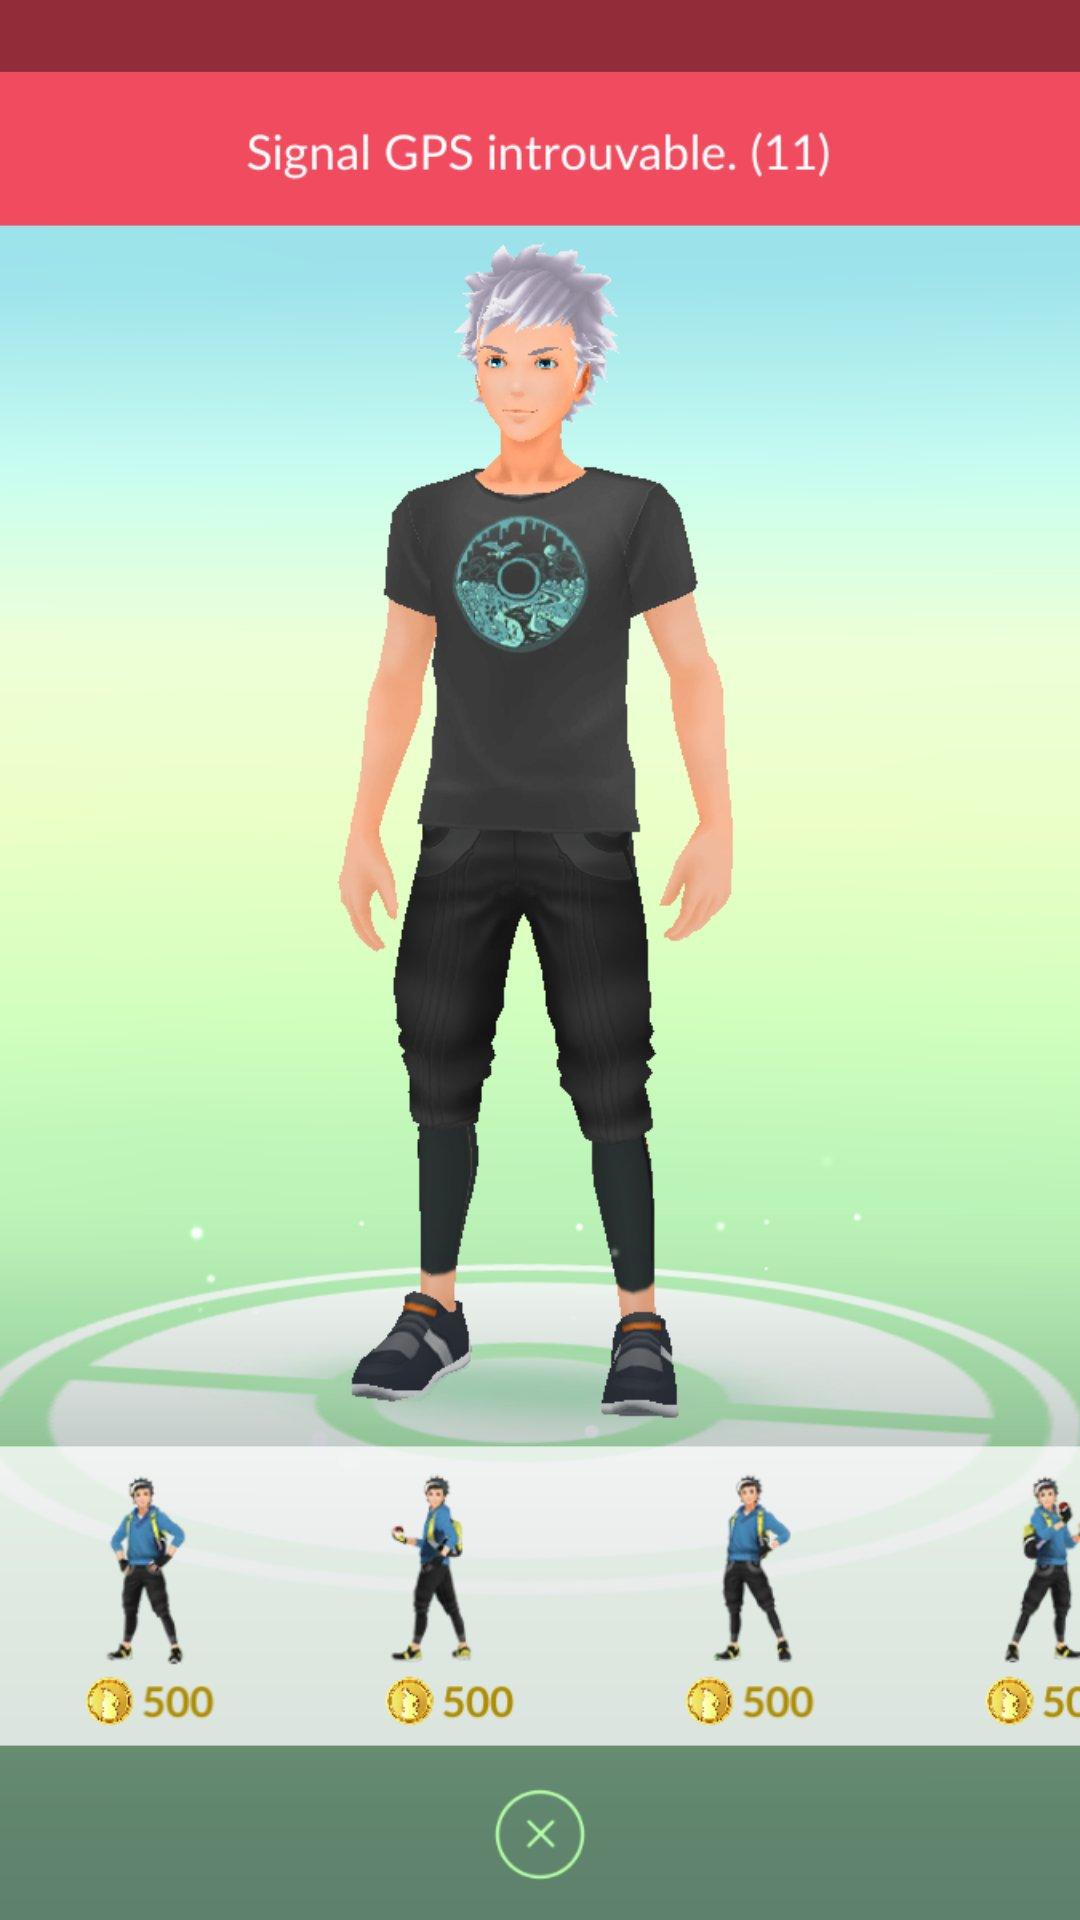 Pokémon GO : Les Poses d'avatar